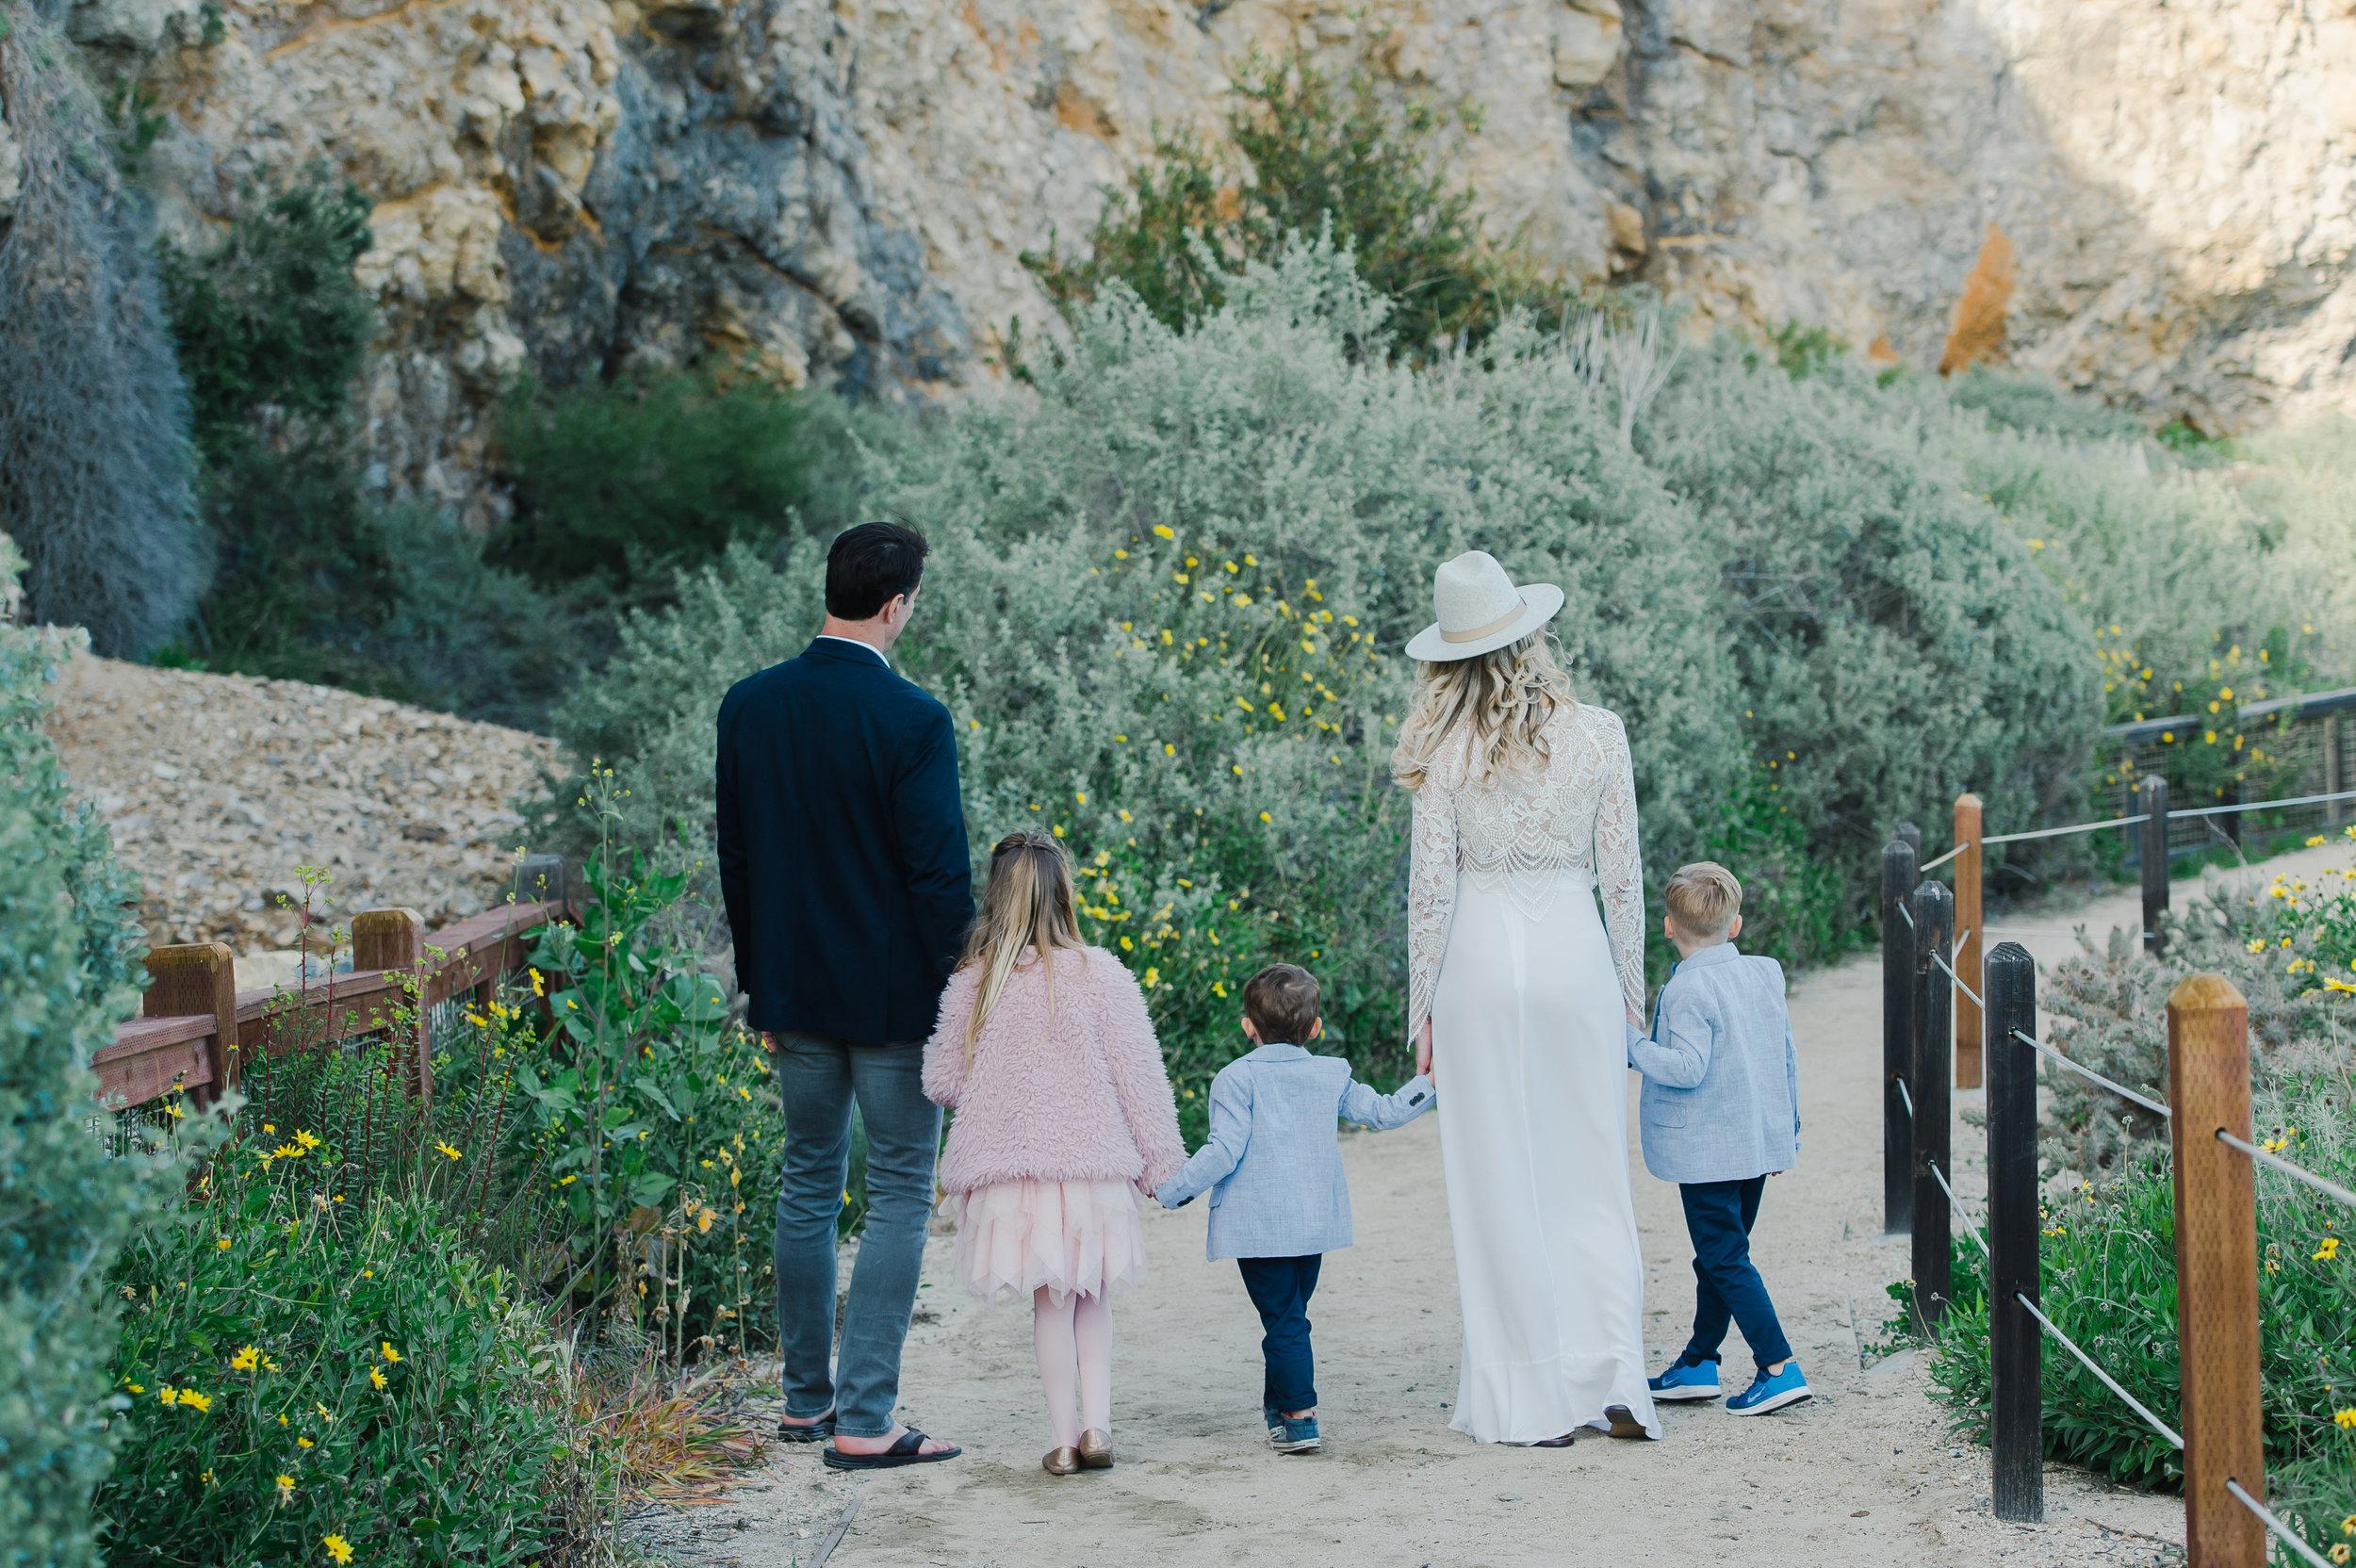 4terranearesortfamilyphotography.jpg